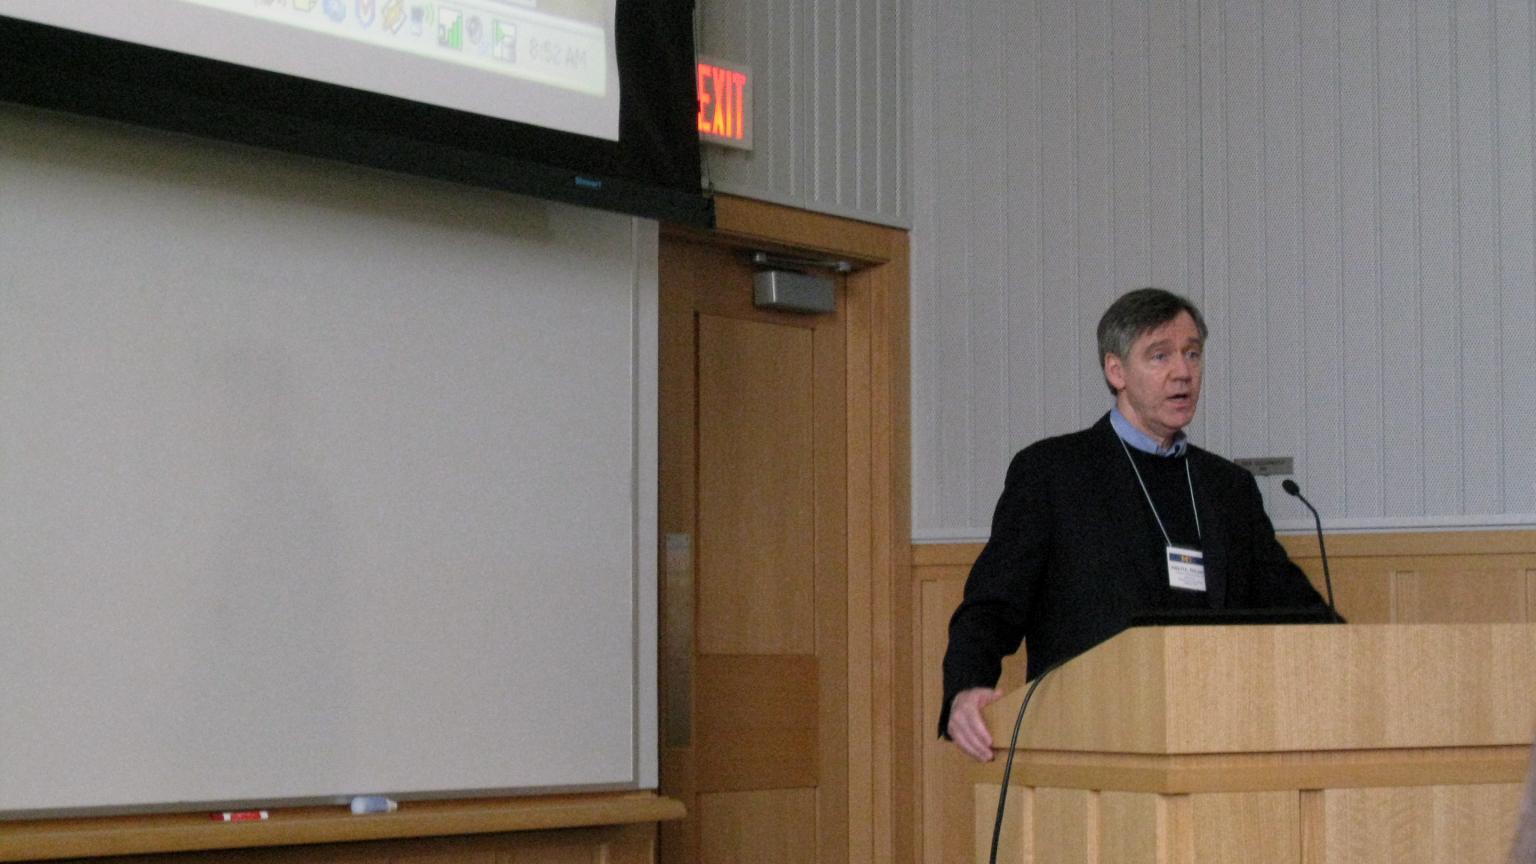 PFRG Day Presentation by Dr. DeLancey